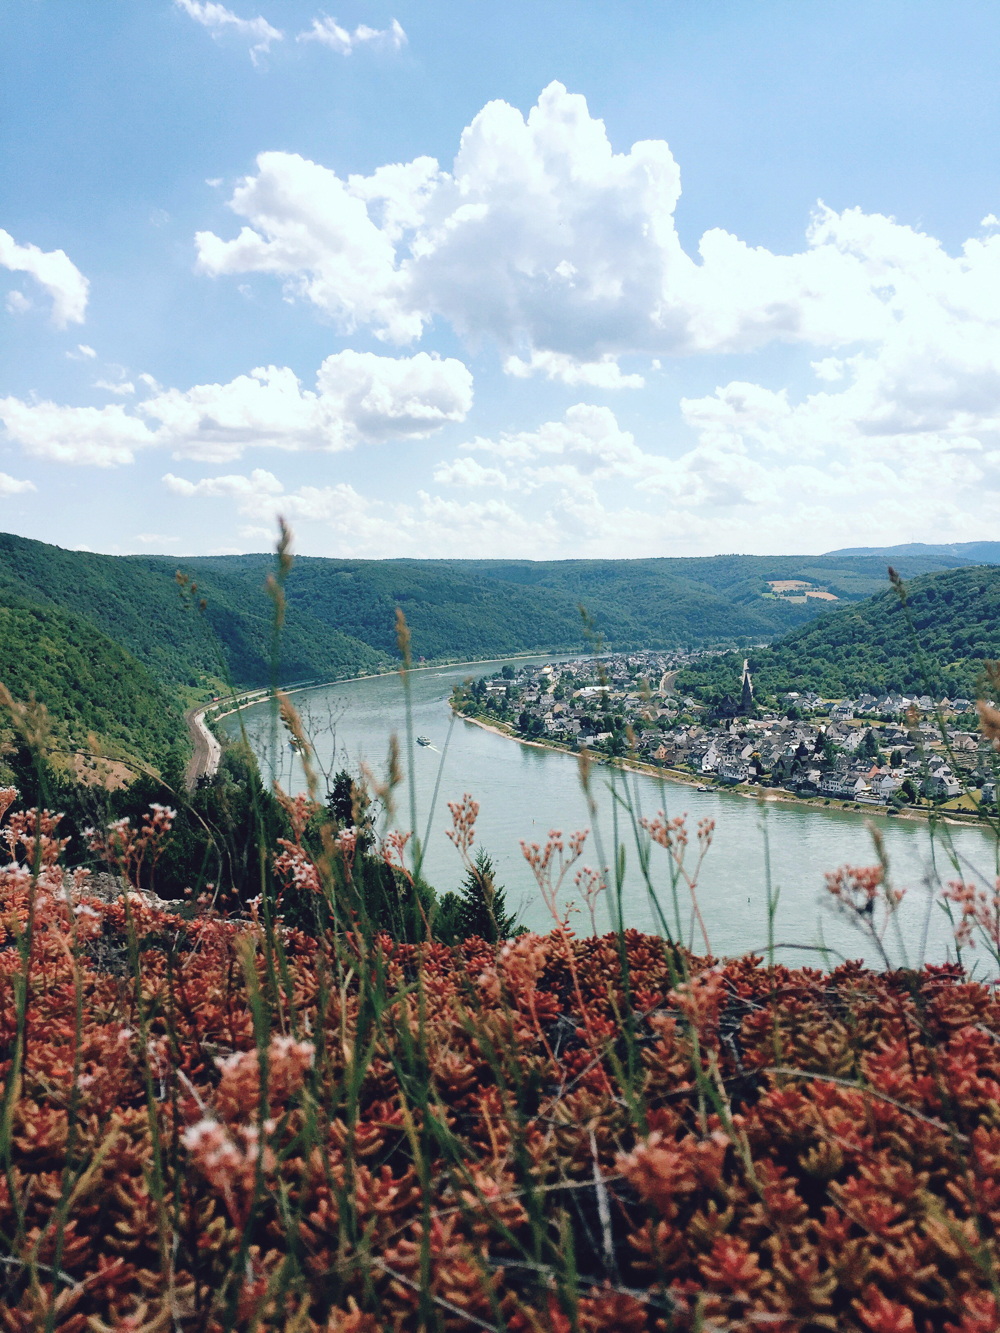 Rheinland-Pfalz and the romantic Rhine River, Germany